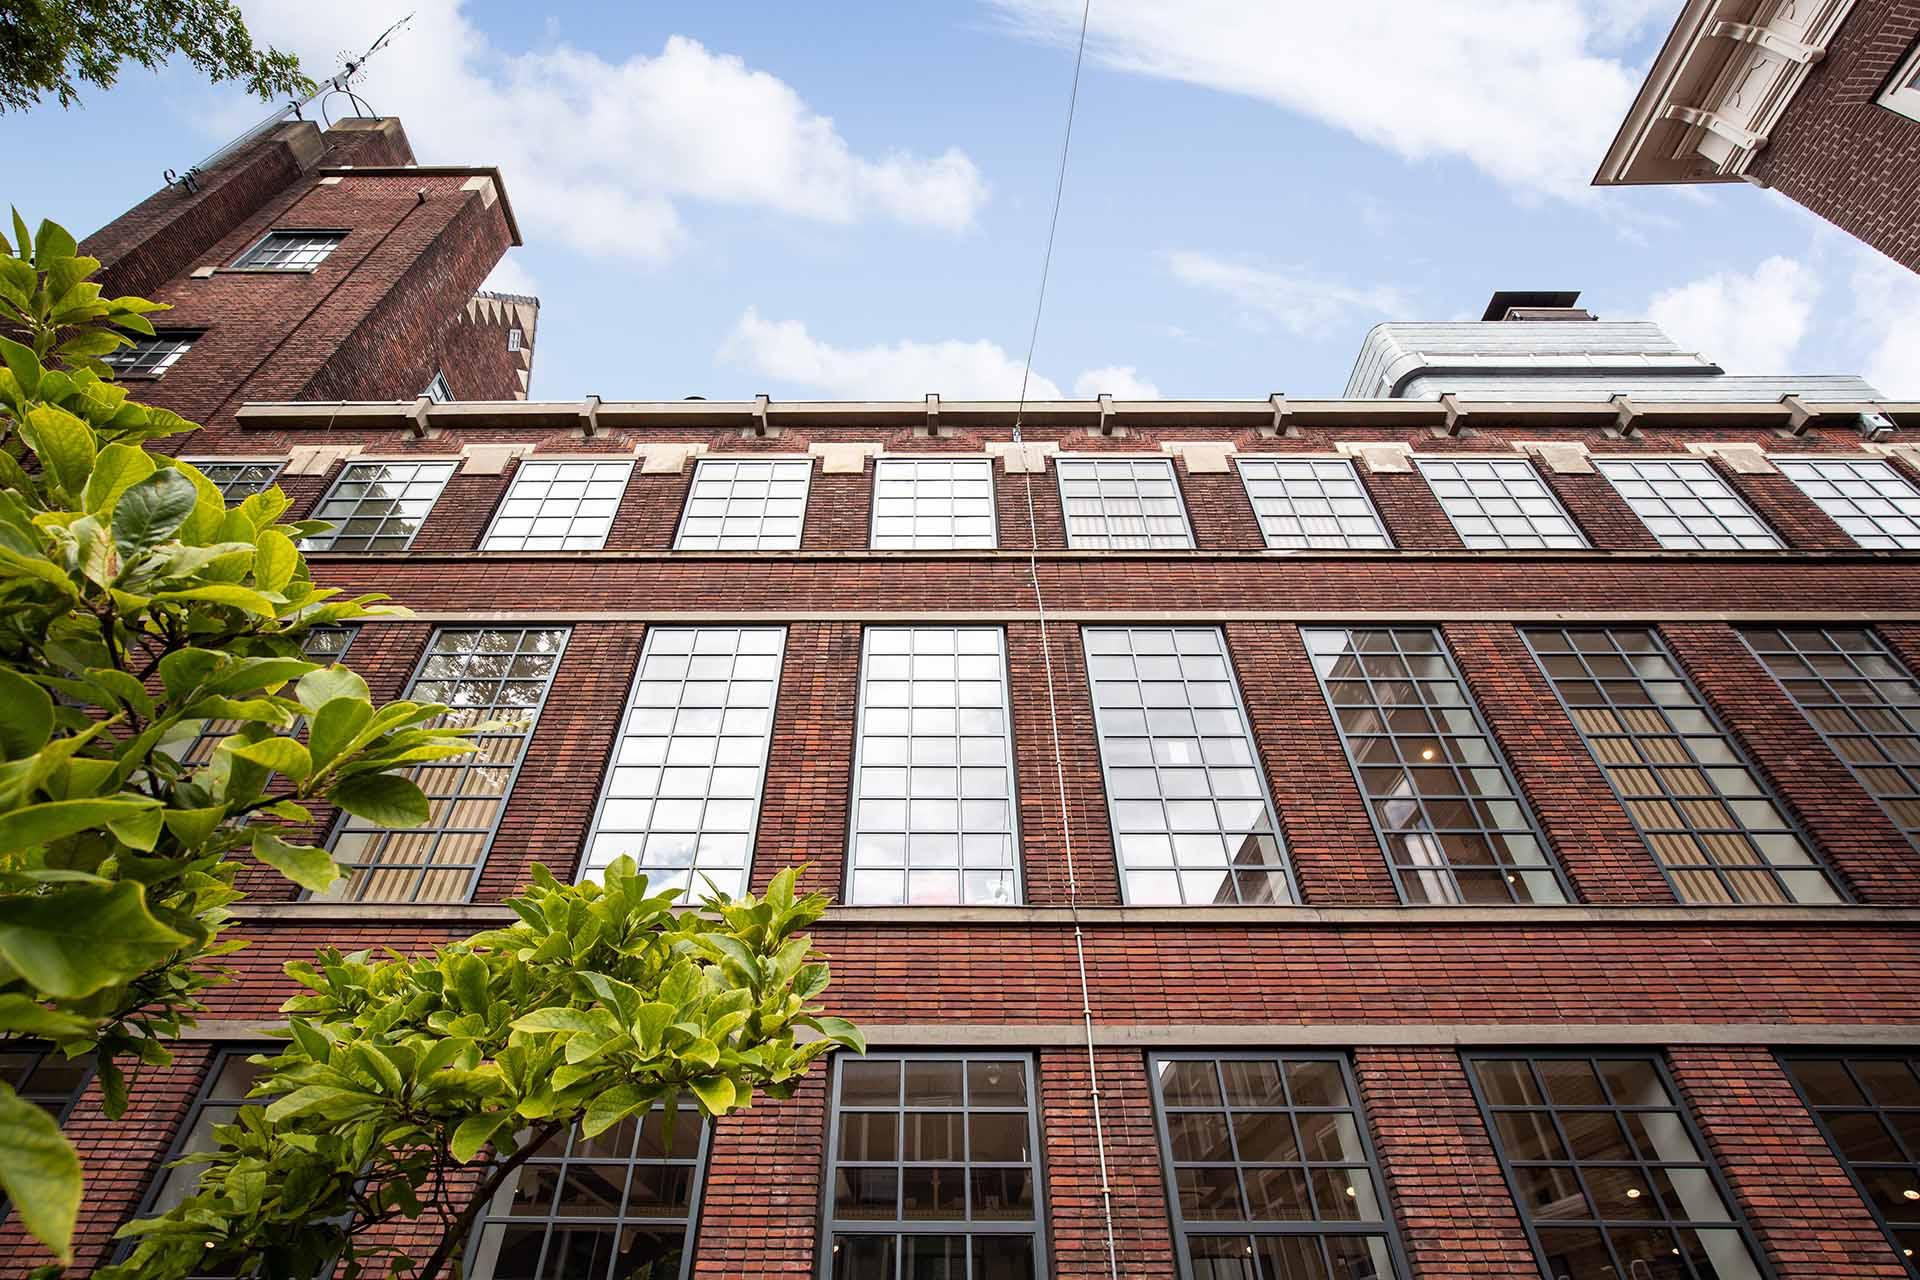 Vleeshal, Amsterdam Rokin, NL (7)